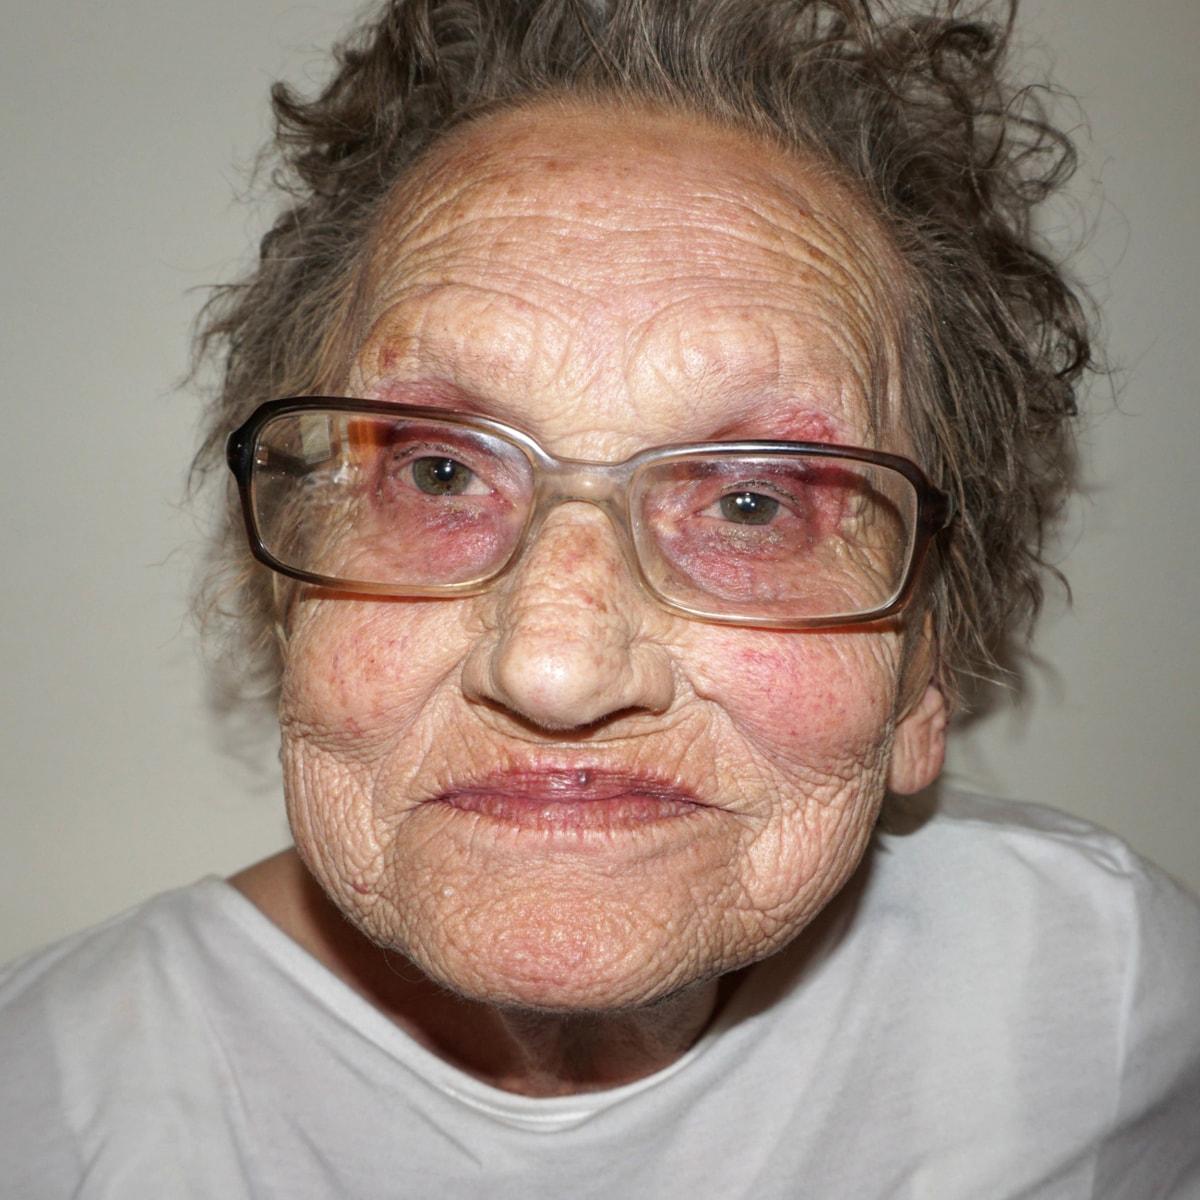 tea flego s grandma livia gets an incredible makeup transformation